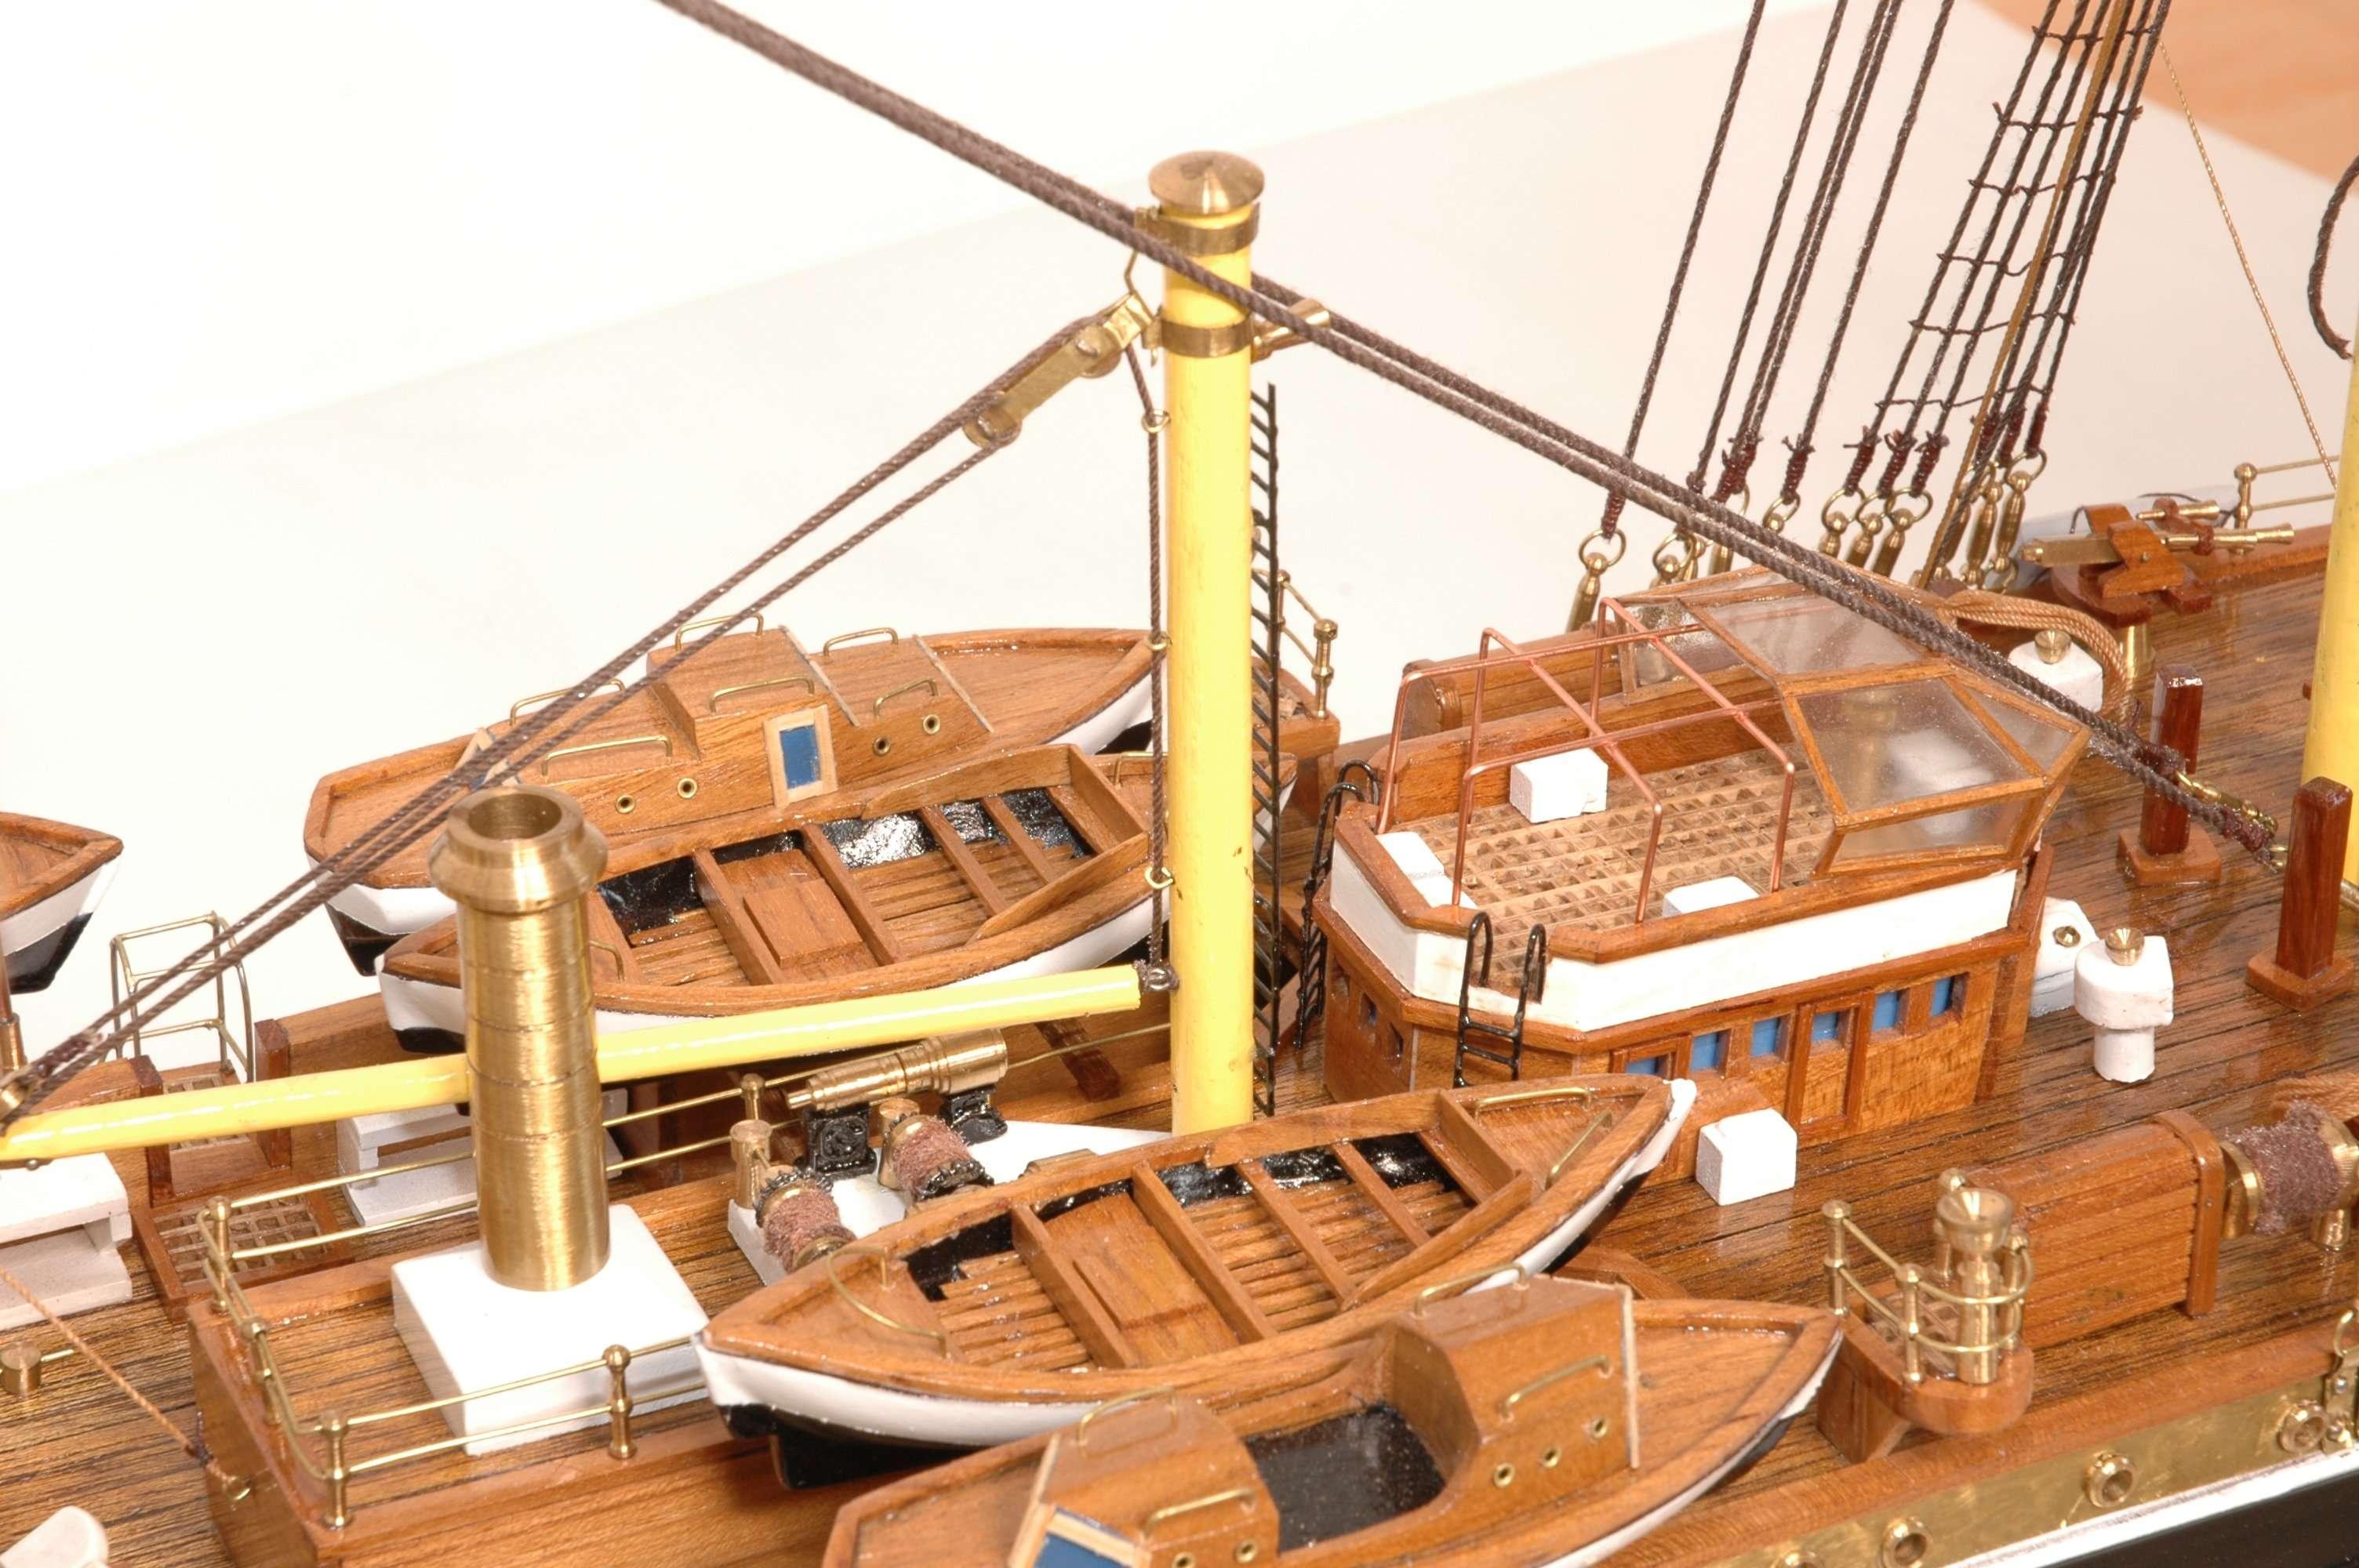 498-4215-Amerigo-Vespucci-Model-Ship-Superior-Range